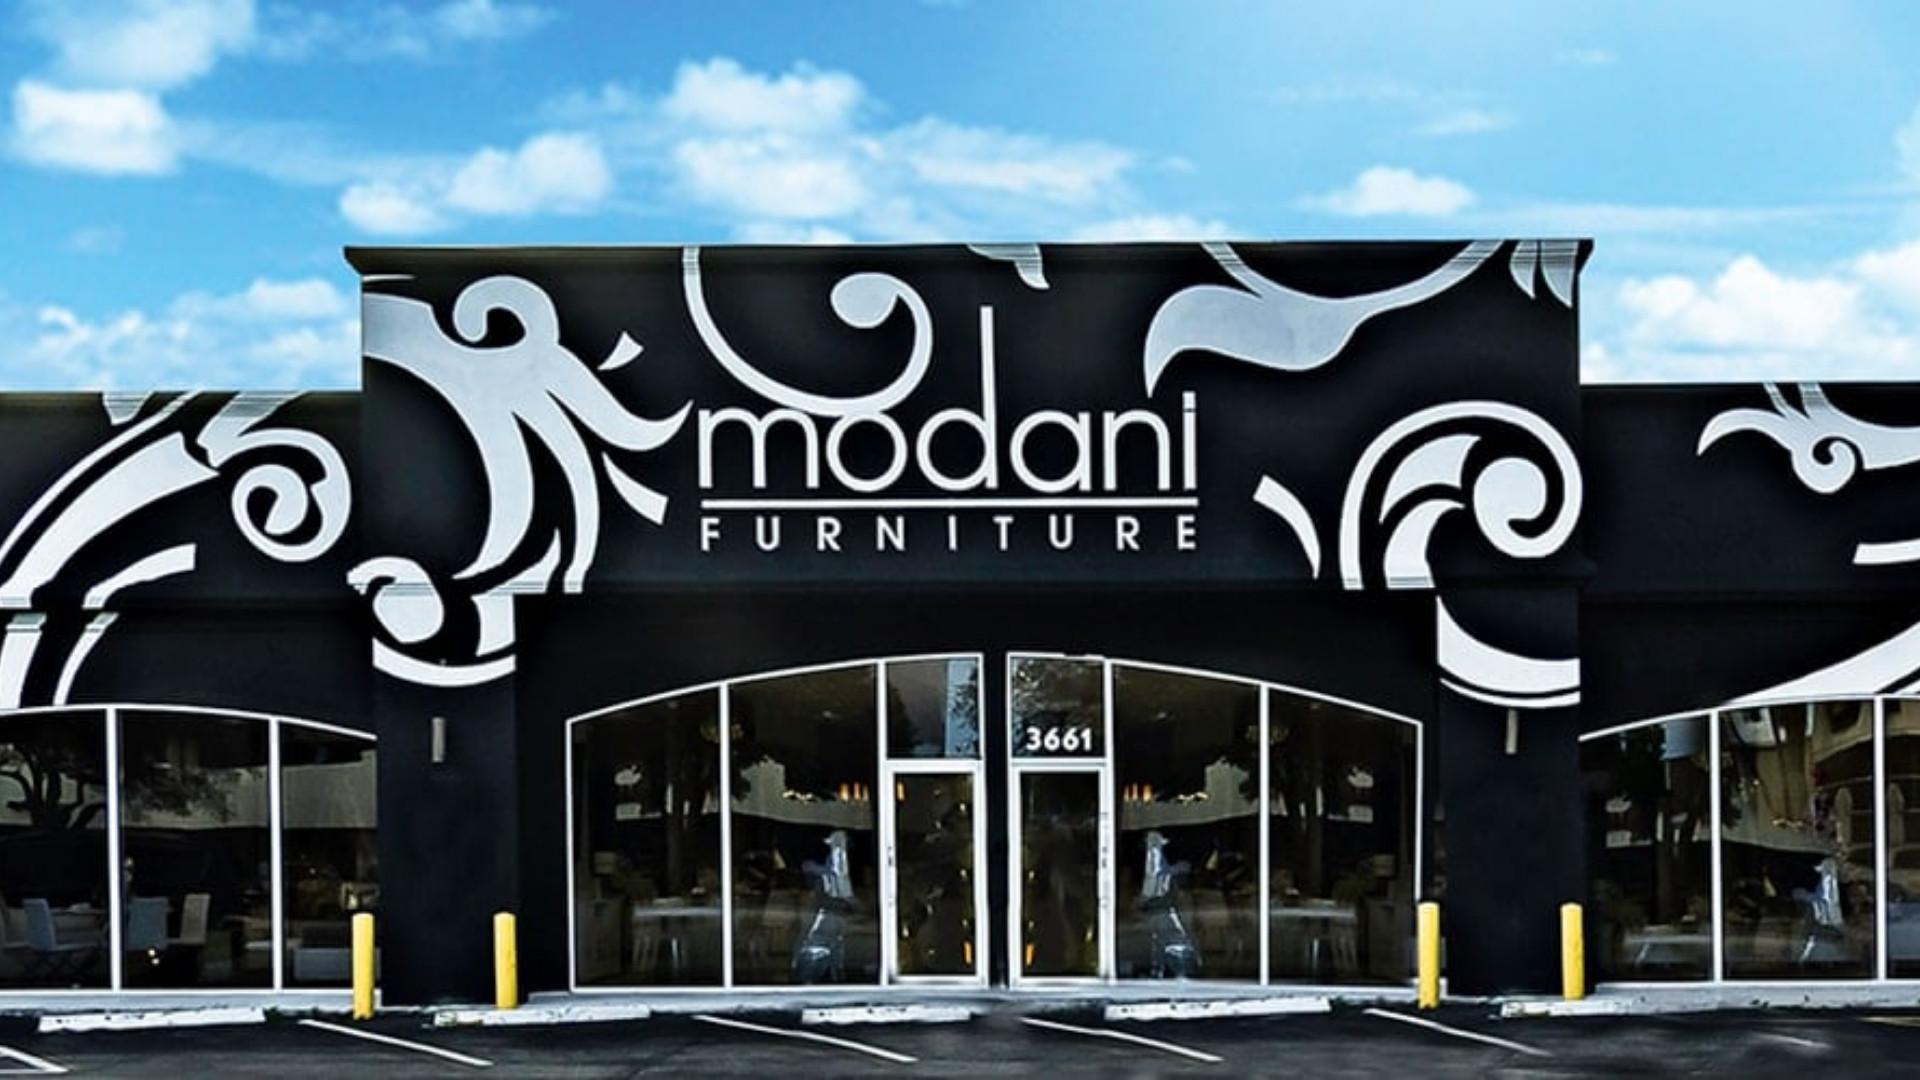 Modani Furniture Boca Raton Reviews, Ratings   Furniture Stores near 7720 N Federal Highway , Boca Raton FL